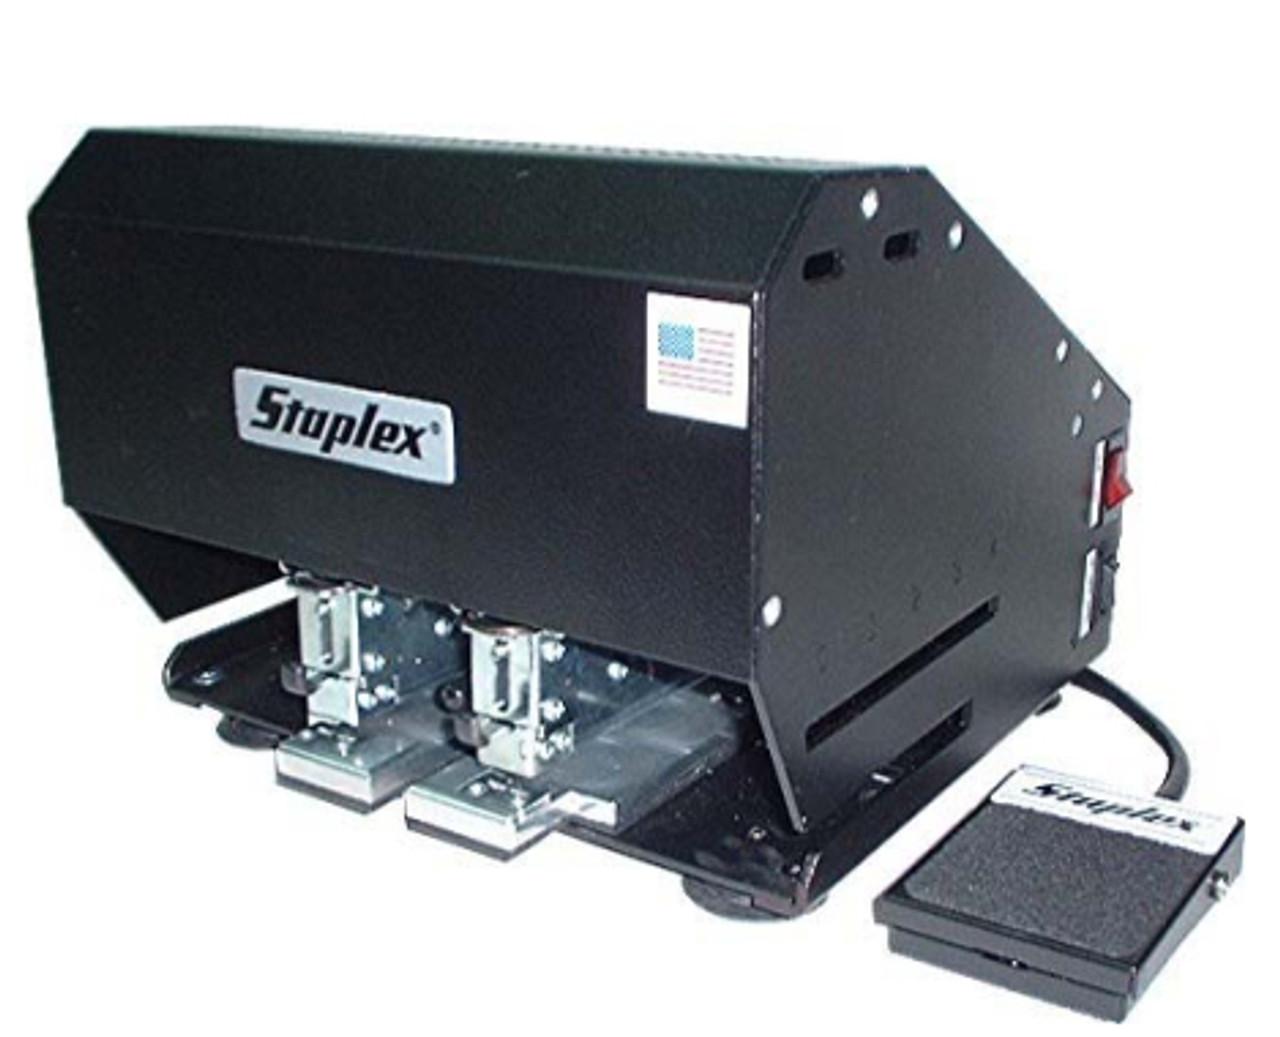 Staplex S-620NRD Thick Wire Series Double Headed Heavy Duty Stapler